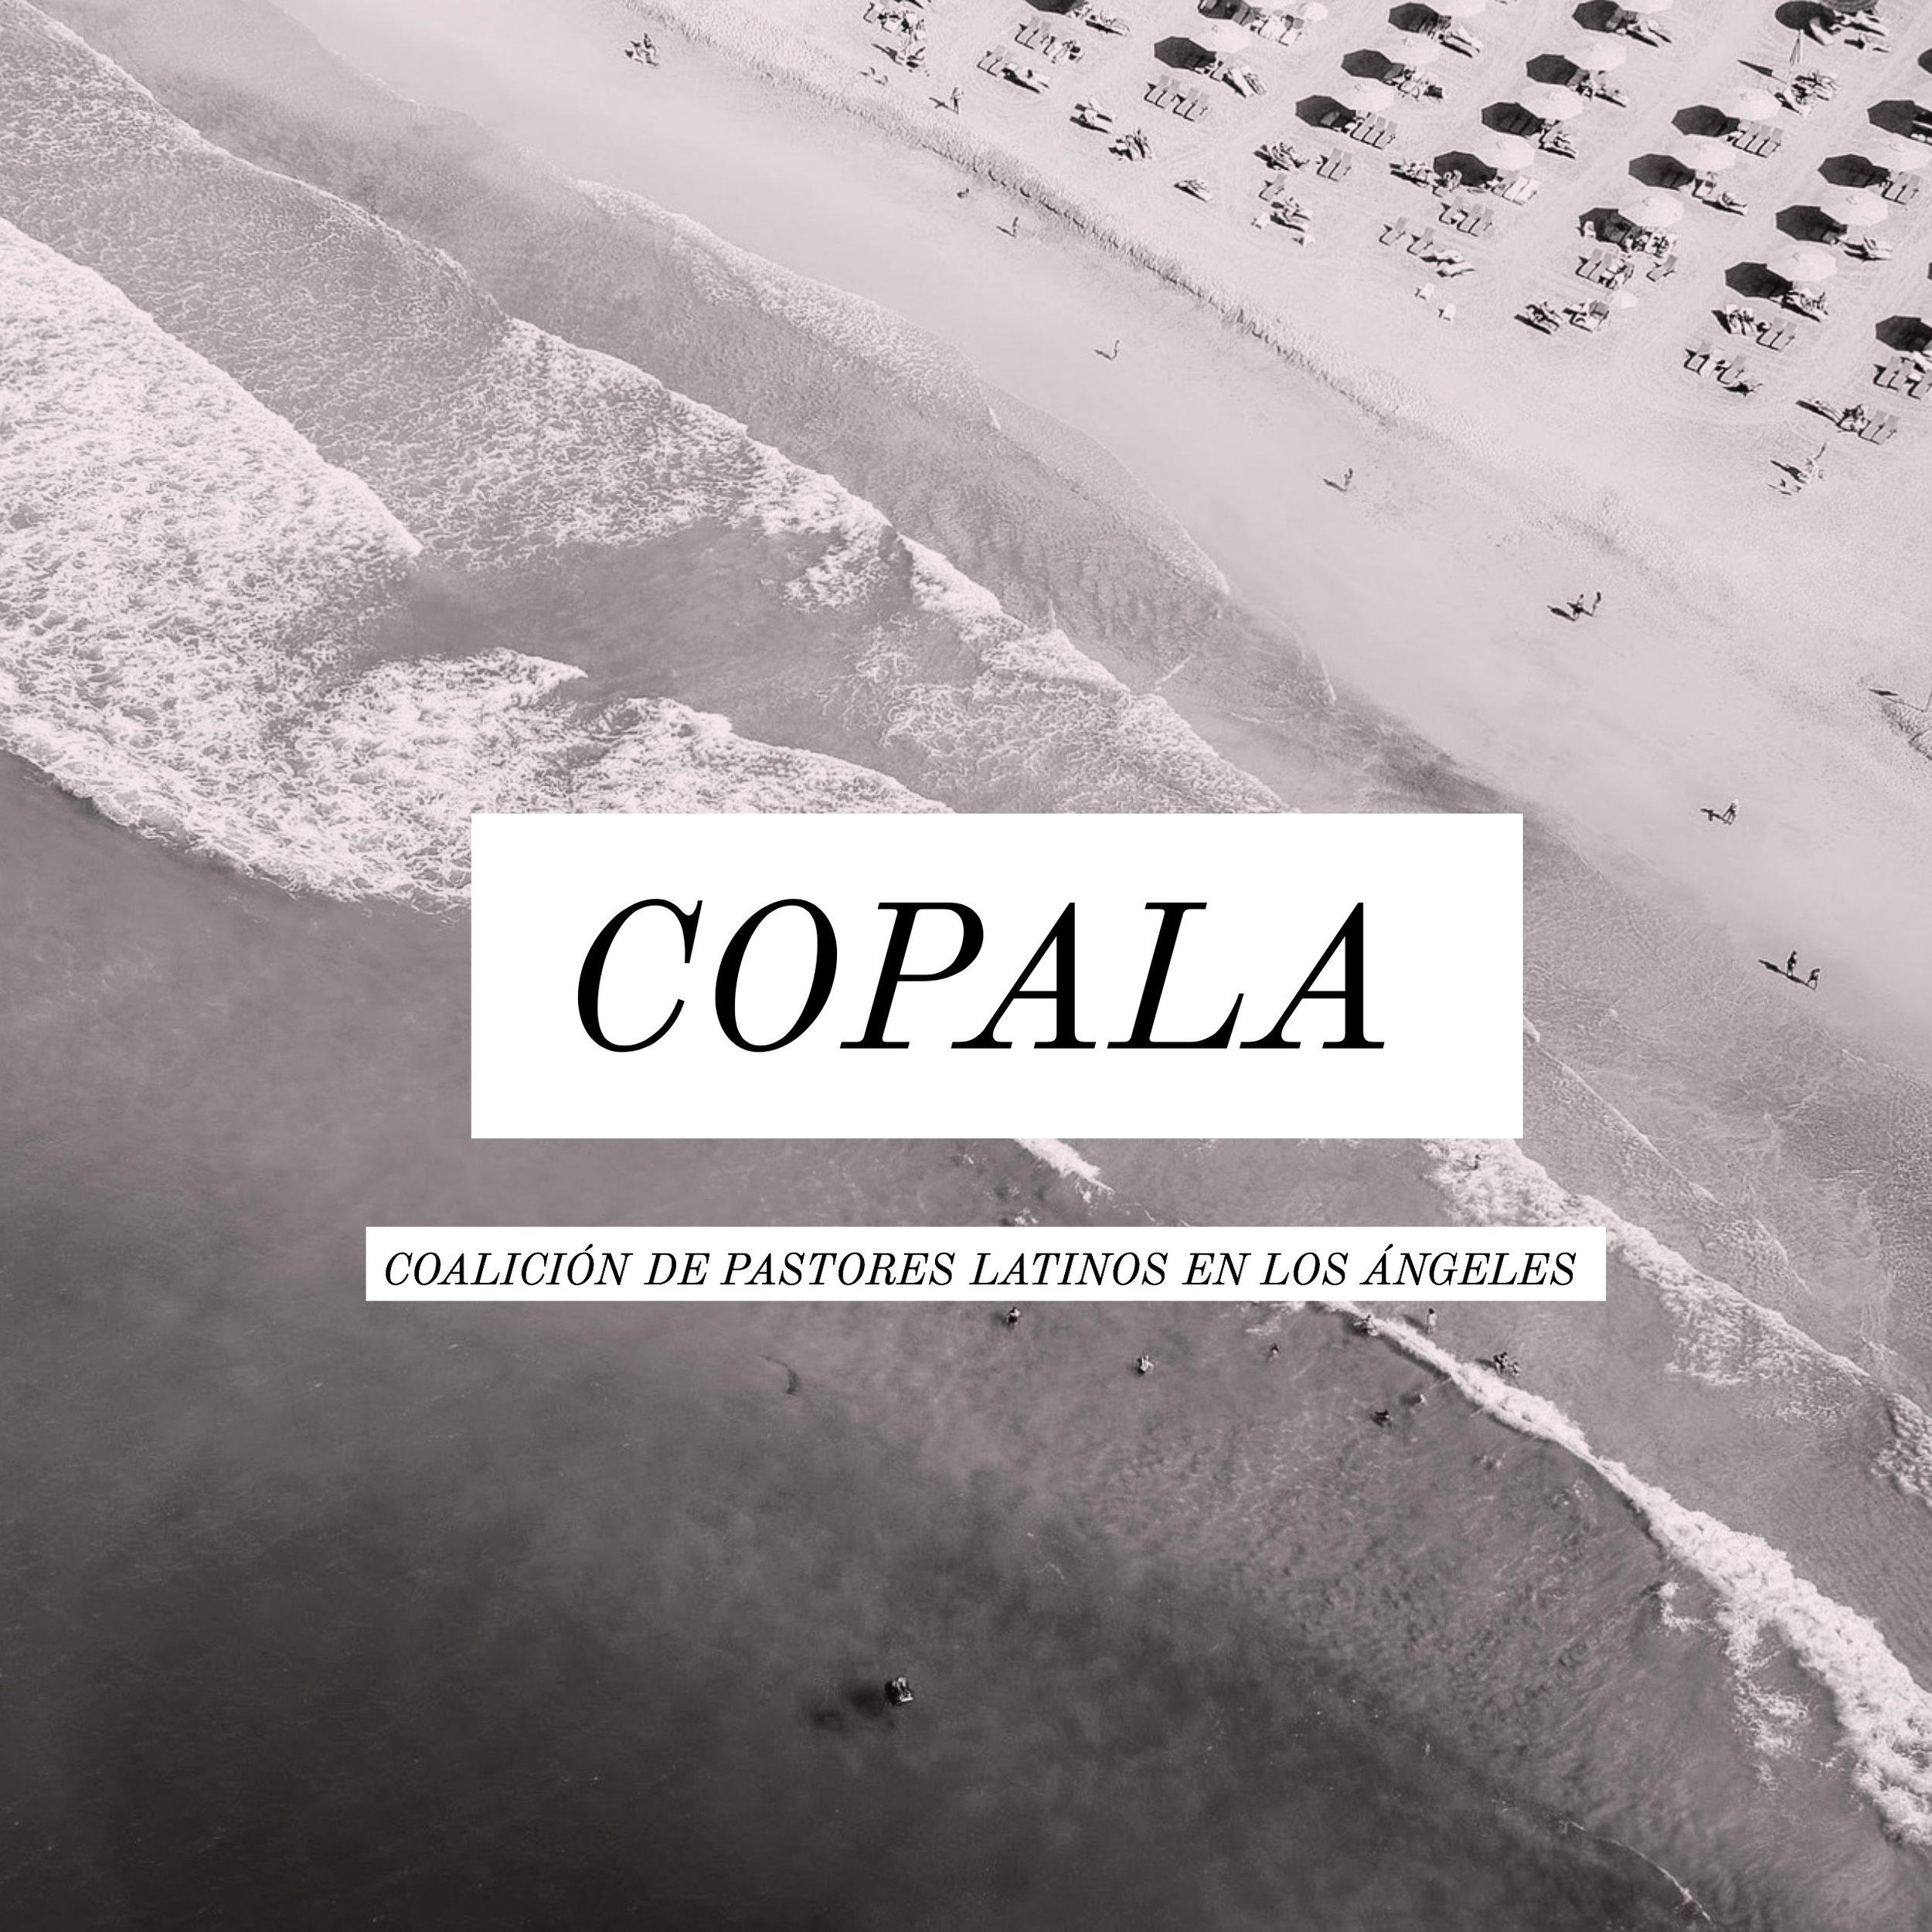 COPALA-1.jpg